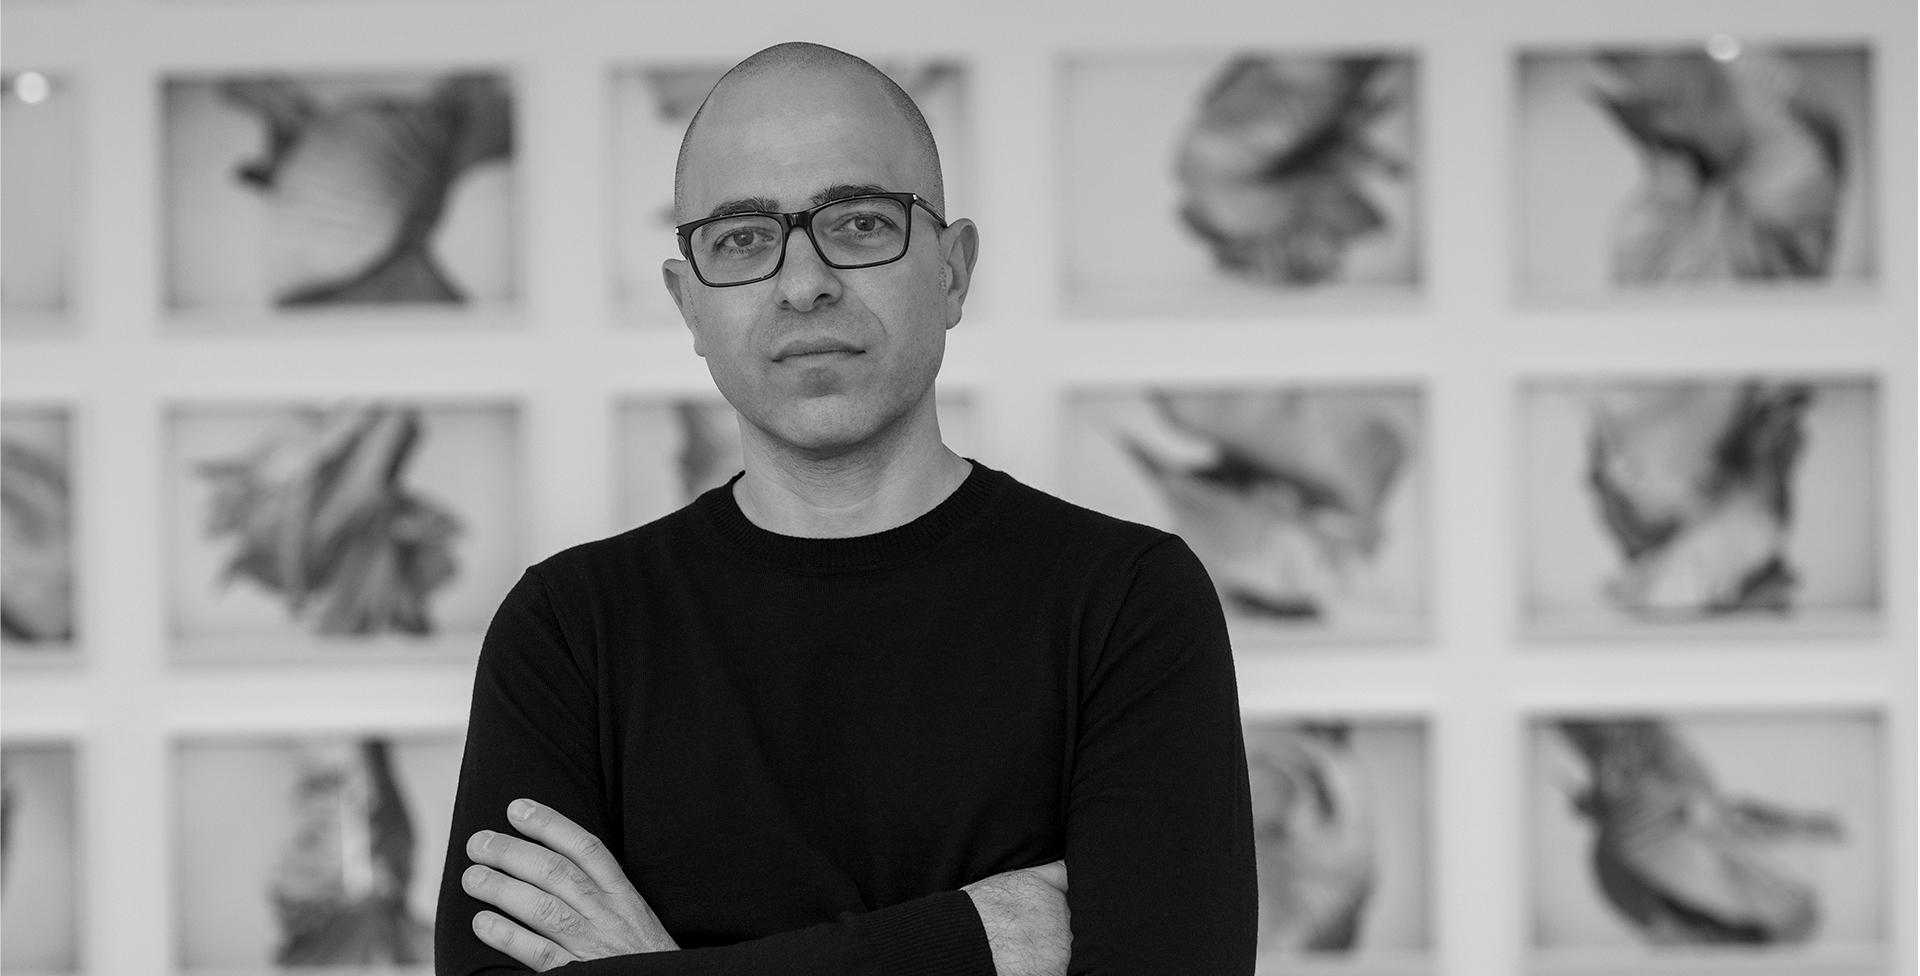 Youssef Nabil - Men's Style Council Member